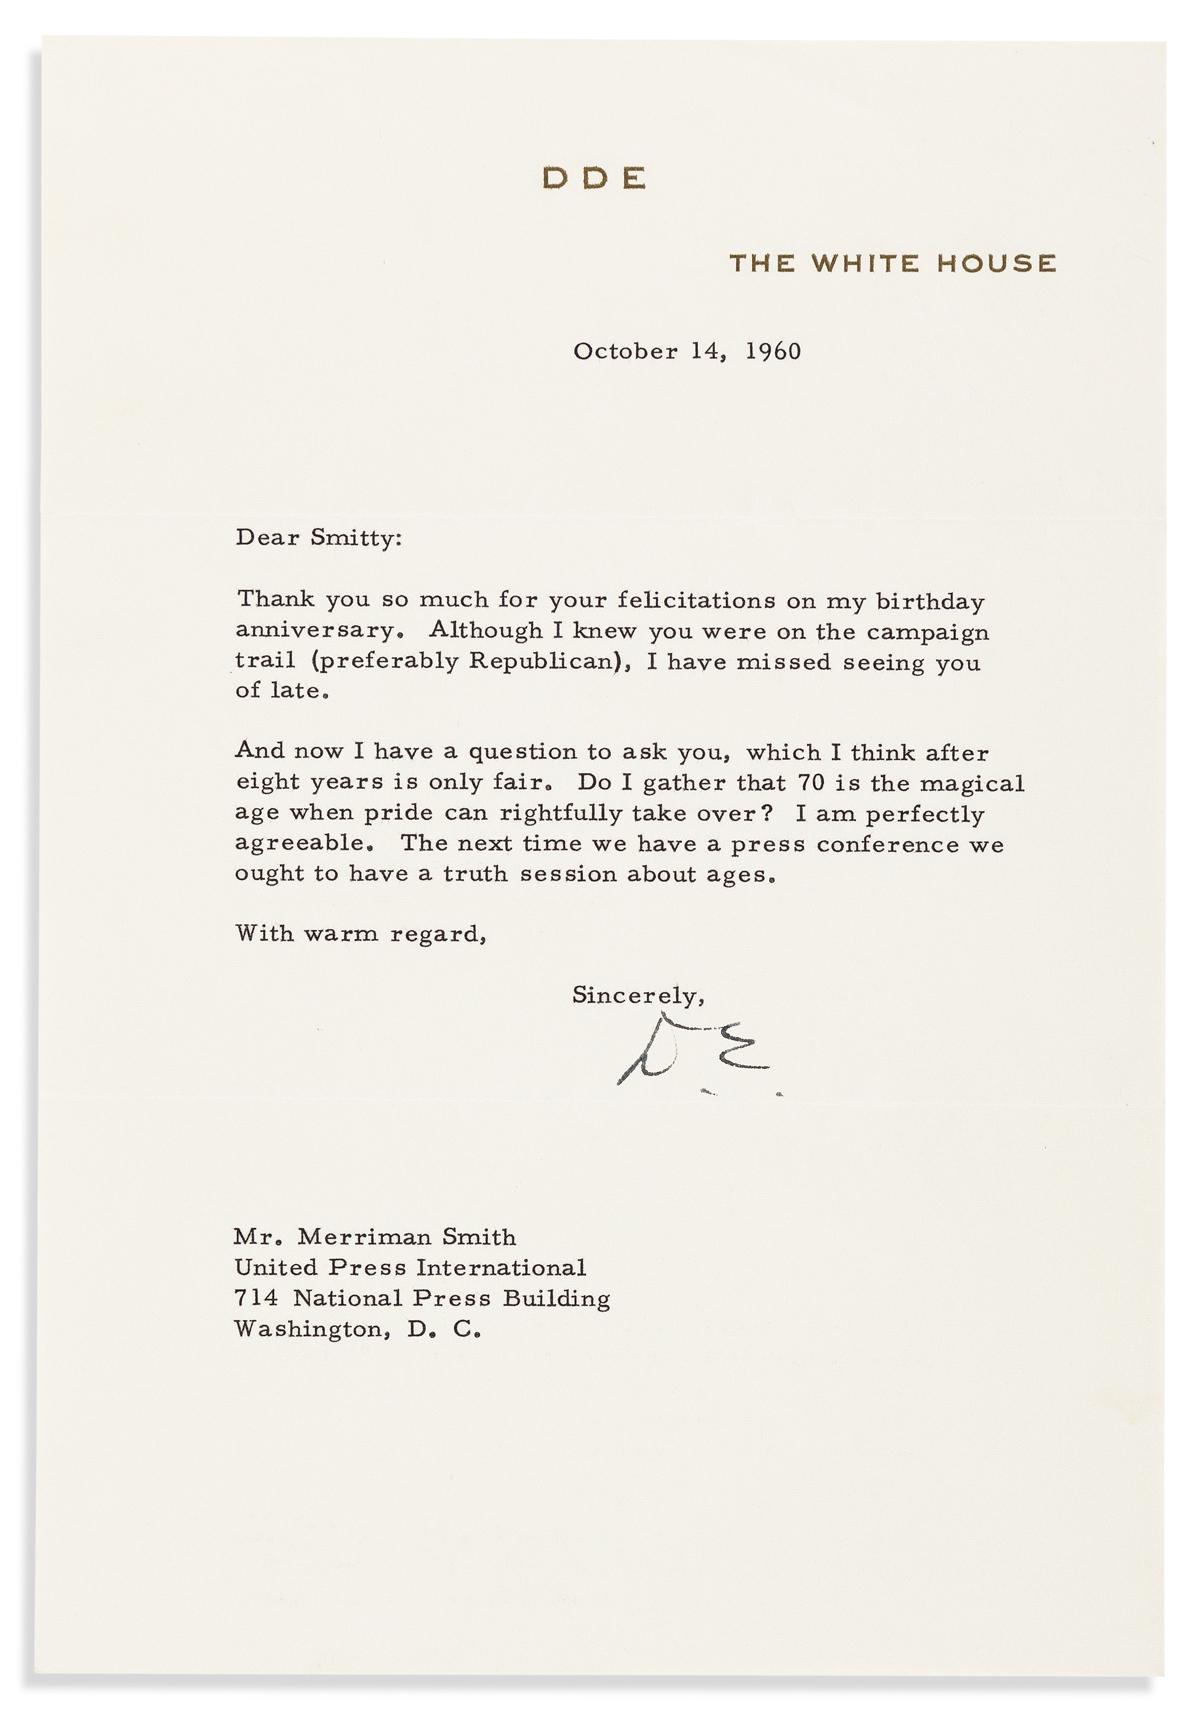 EISENHOWER, DWIGHT D. Typed Letter Signed, D.E., as President, to White House correspondent for UPI Merriman Smith (Dear Smitty),